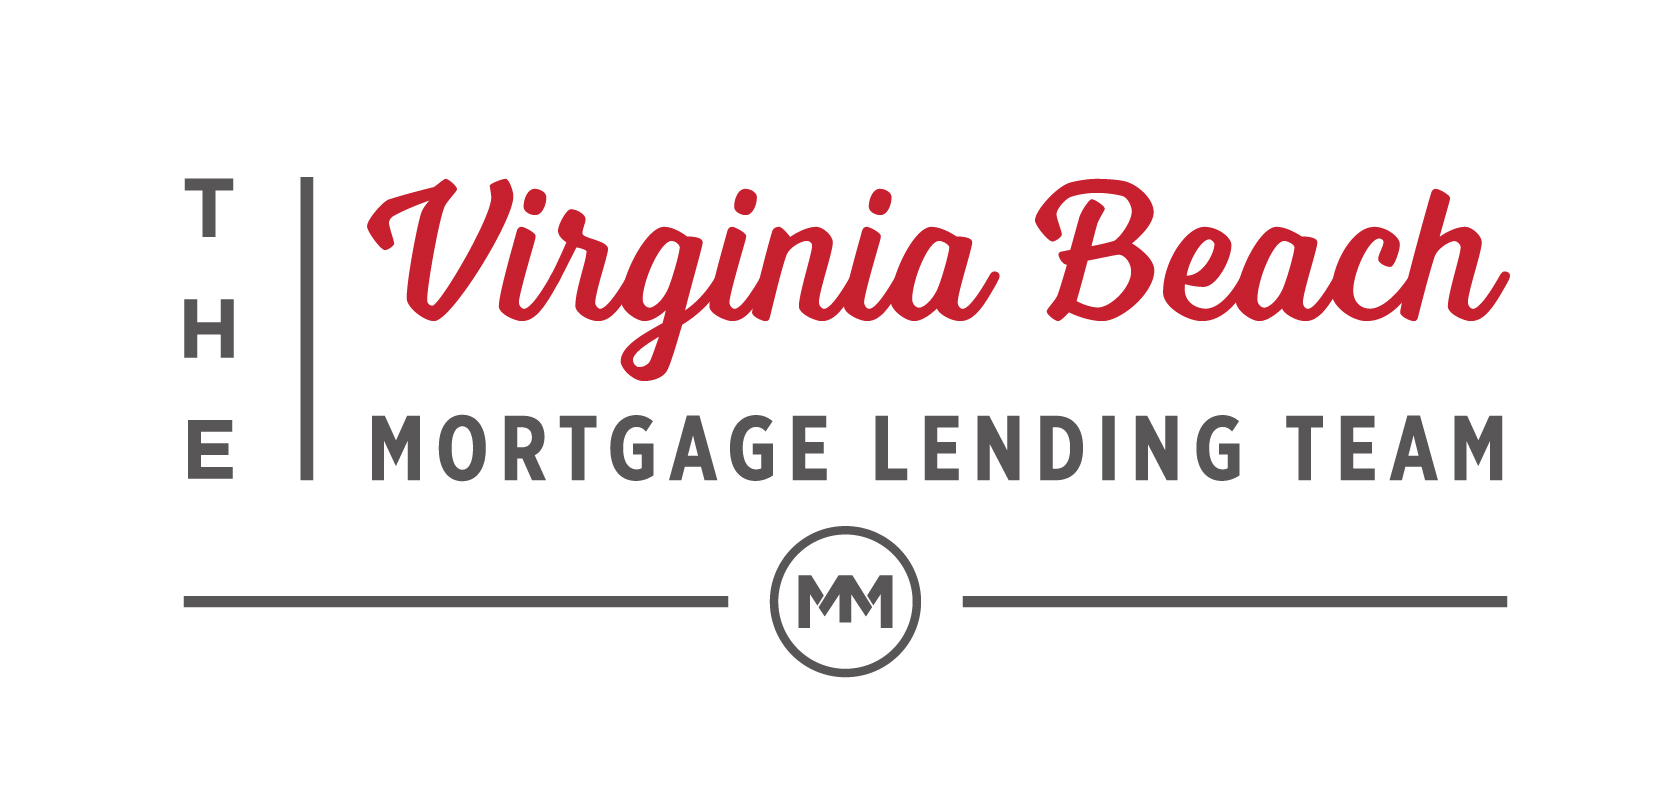 The Virginia Beach Mortgage Lending Team